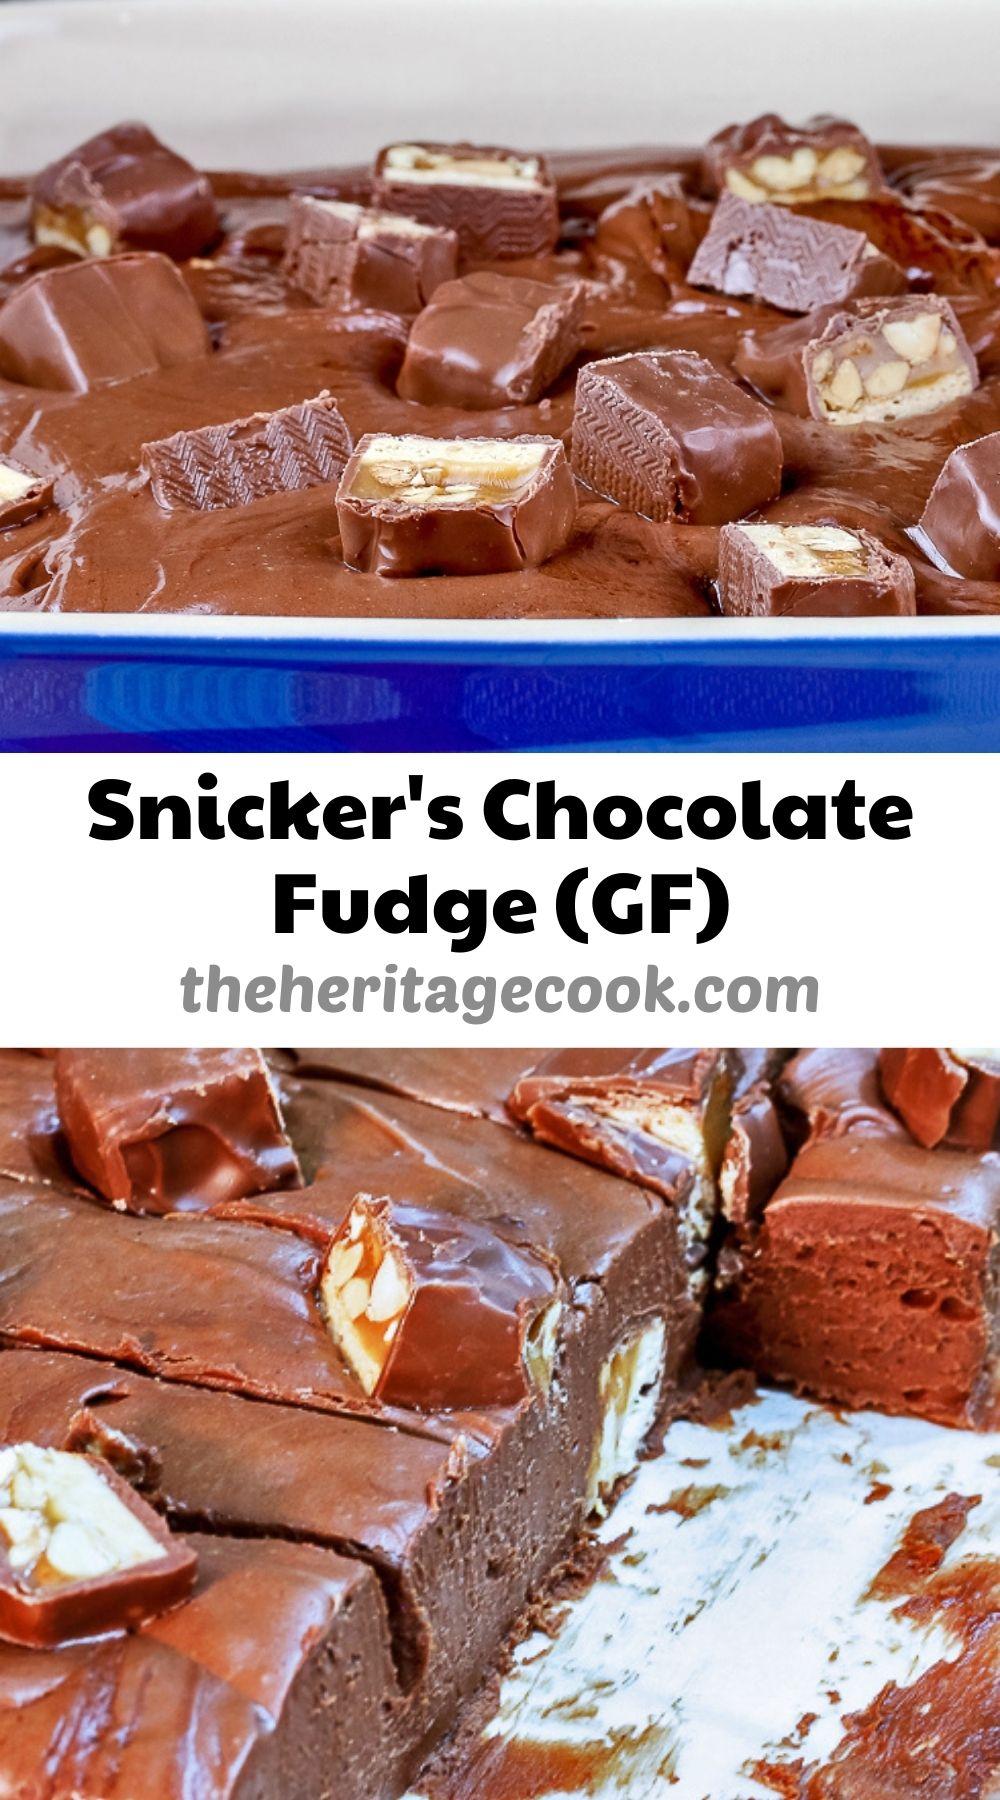 Snickers Chocolate Fudge (Gluten Free) © 2021 Jane Bonacci, The Heritage Cook